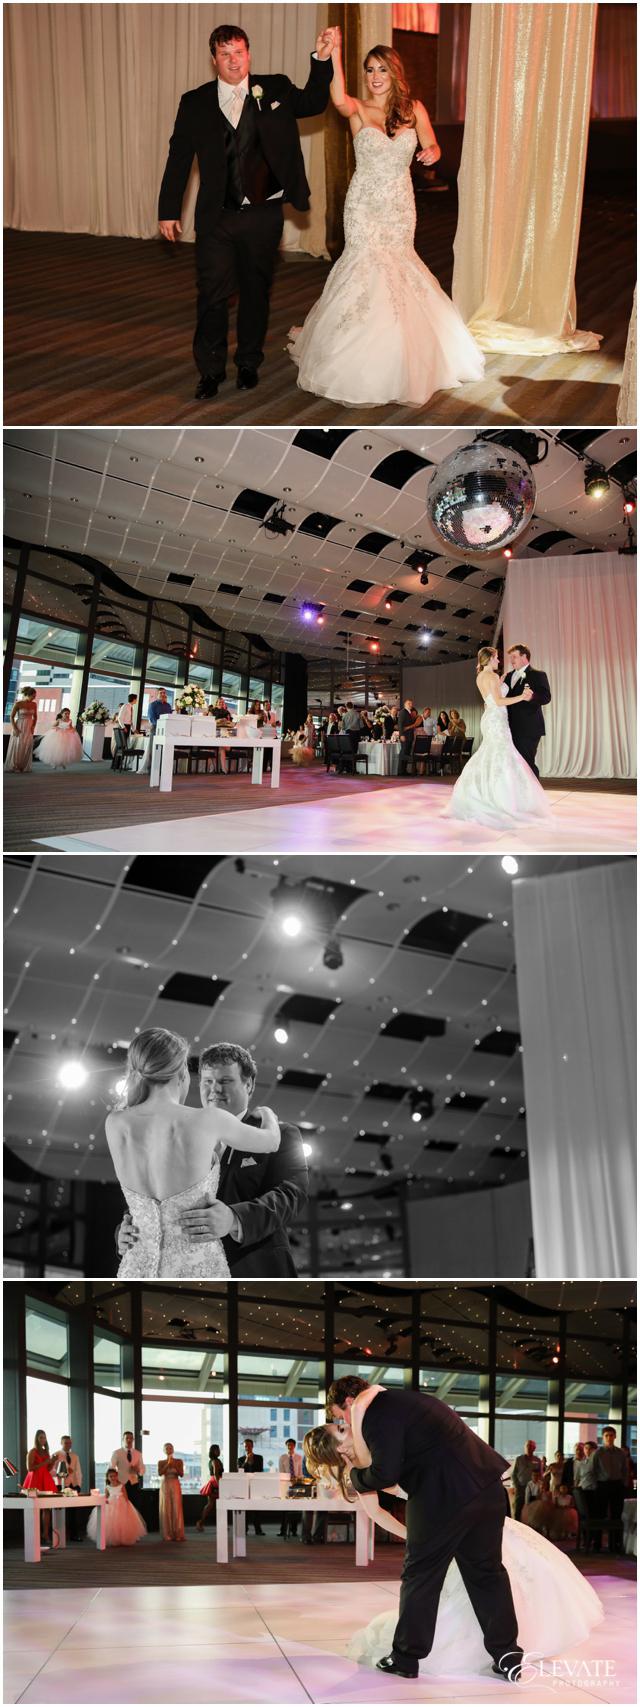 seawell-grand-ballroom-wedding-photos_0048